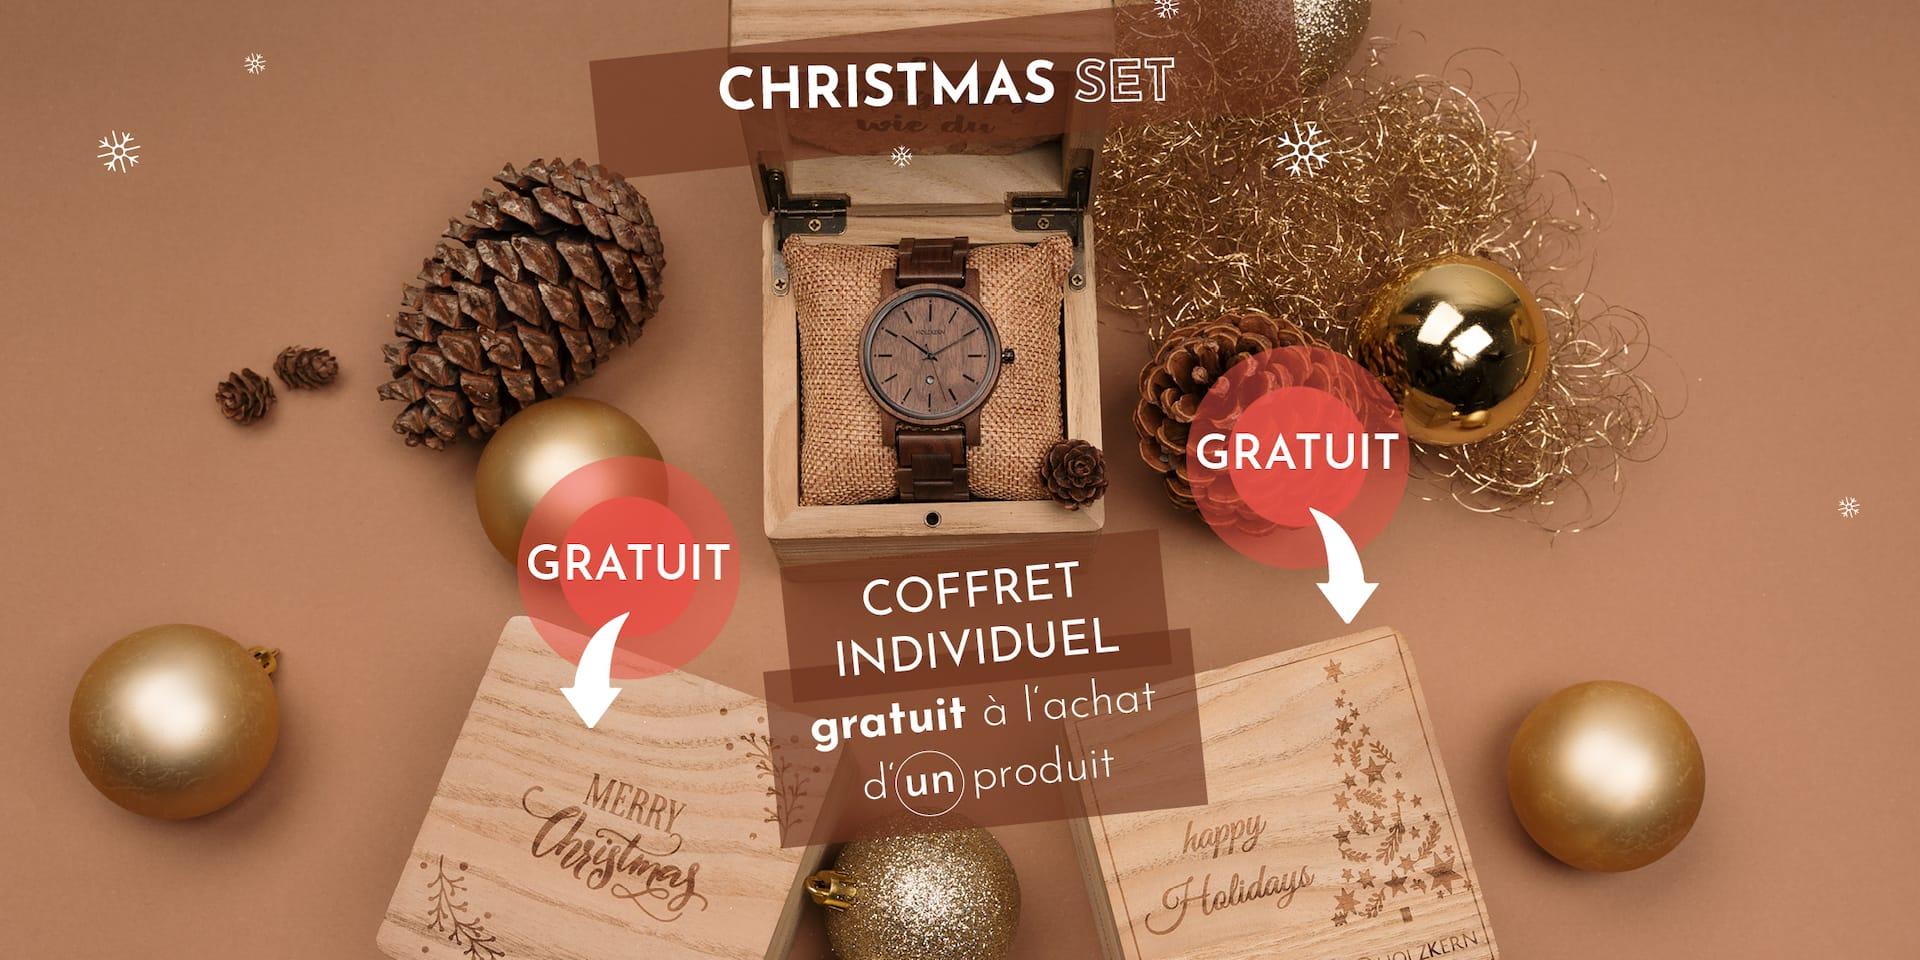 Holzkern Christmas Set